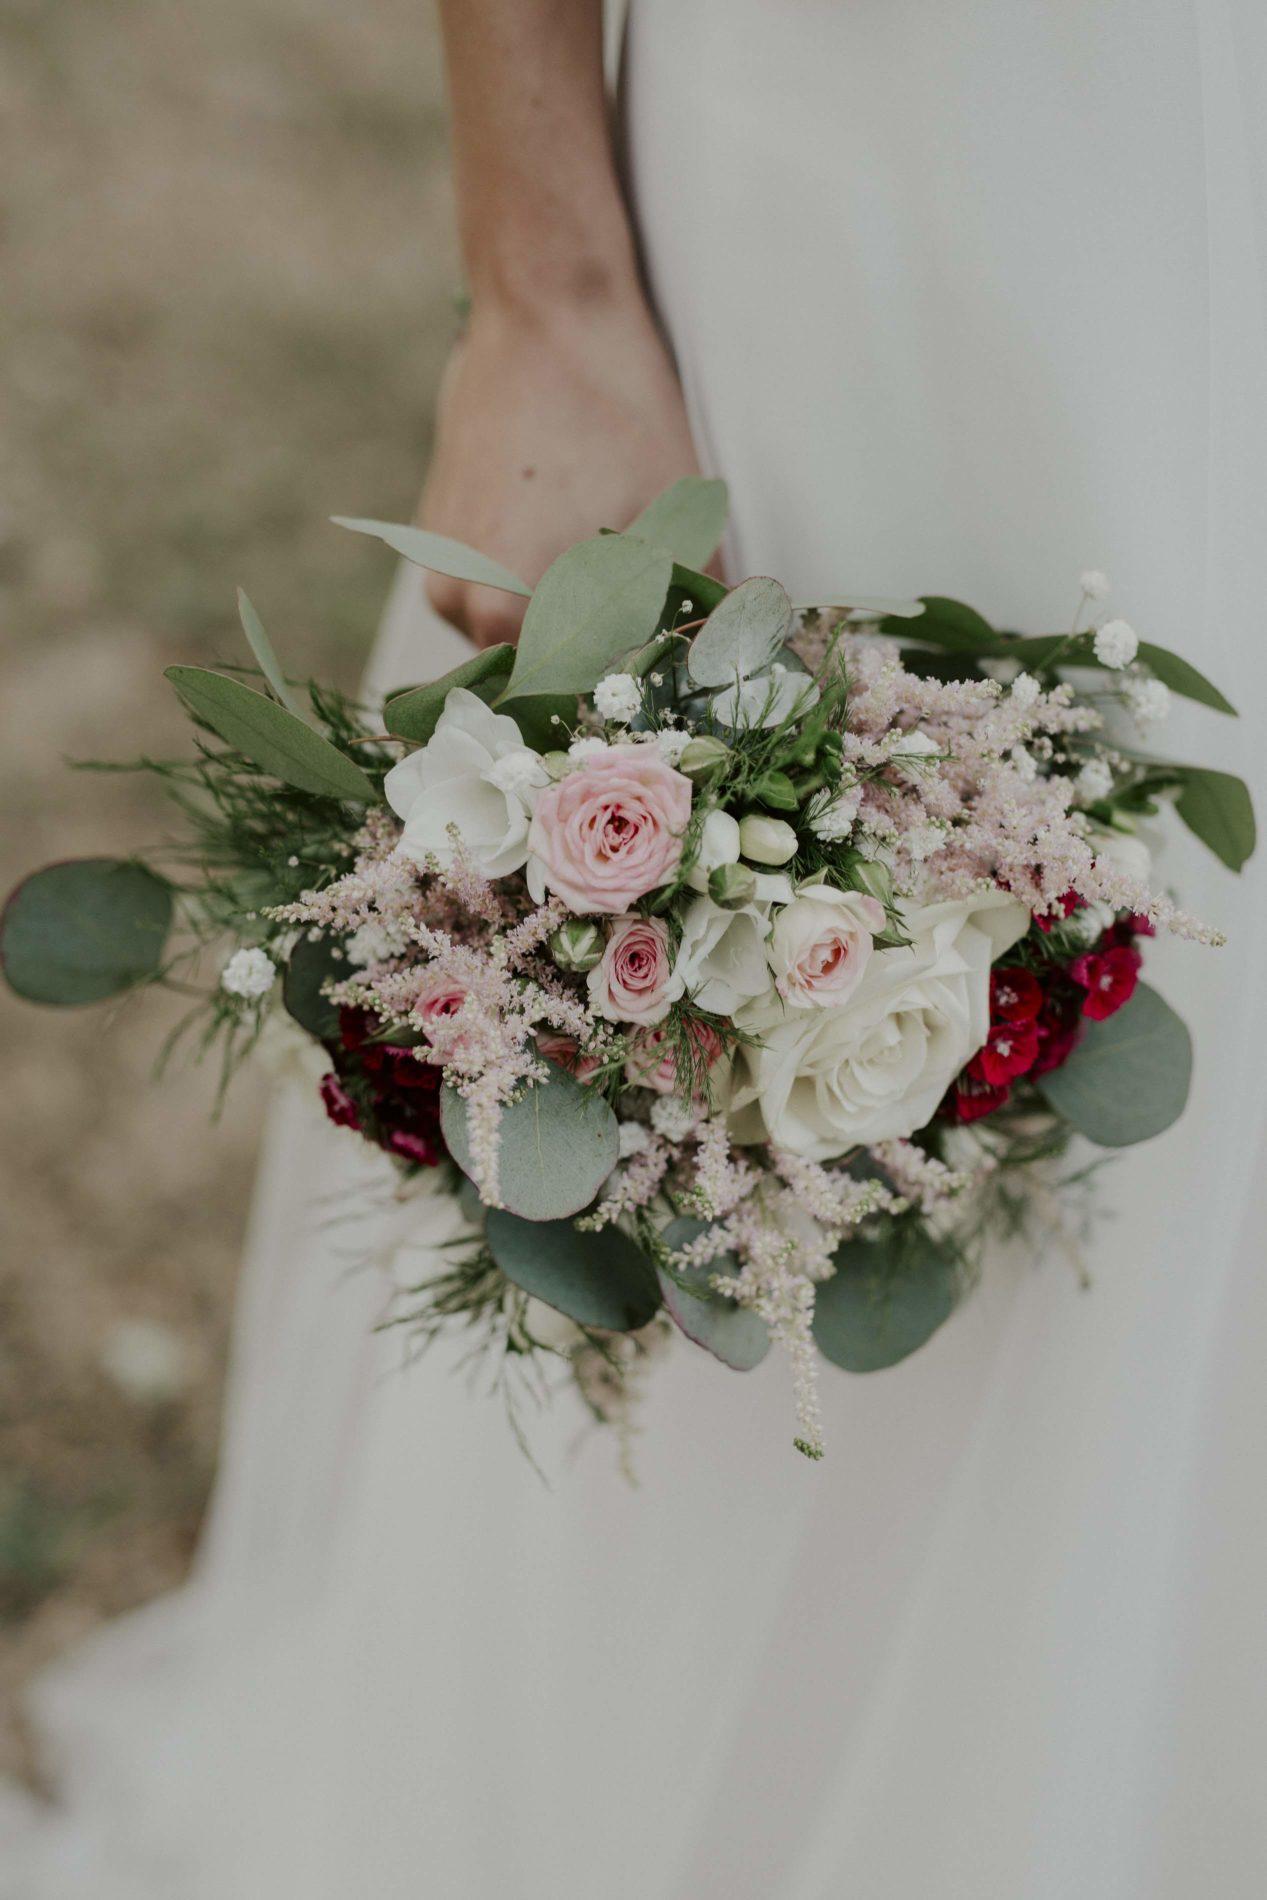 05-CelineSereivuth-17-obonheurdesdames-decoration-mariage-location-Jordane-Chaillou